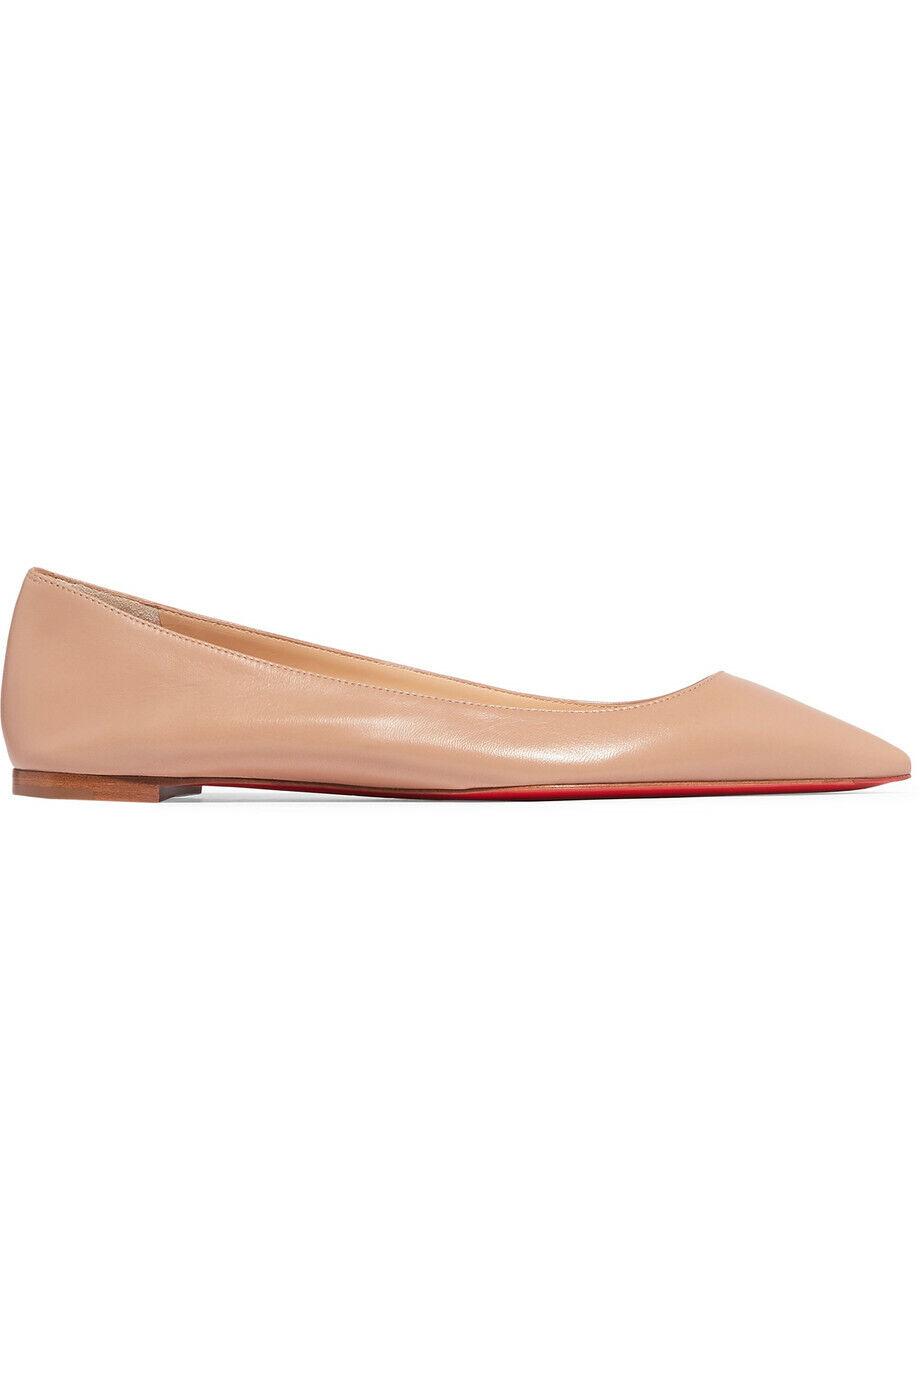 meet 53411 2b650 NEW Christian Louboutin ELOISE Leather Flat Ballerina Ballet Shoes Nude $695